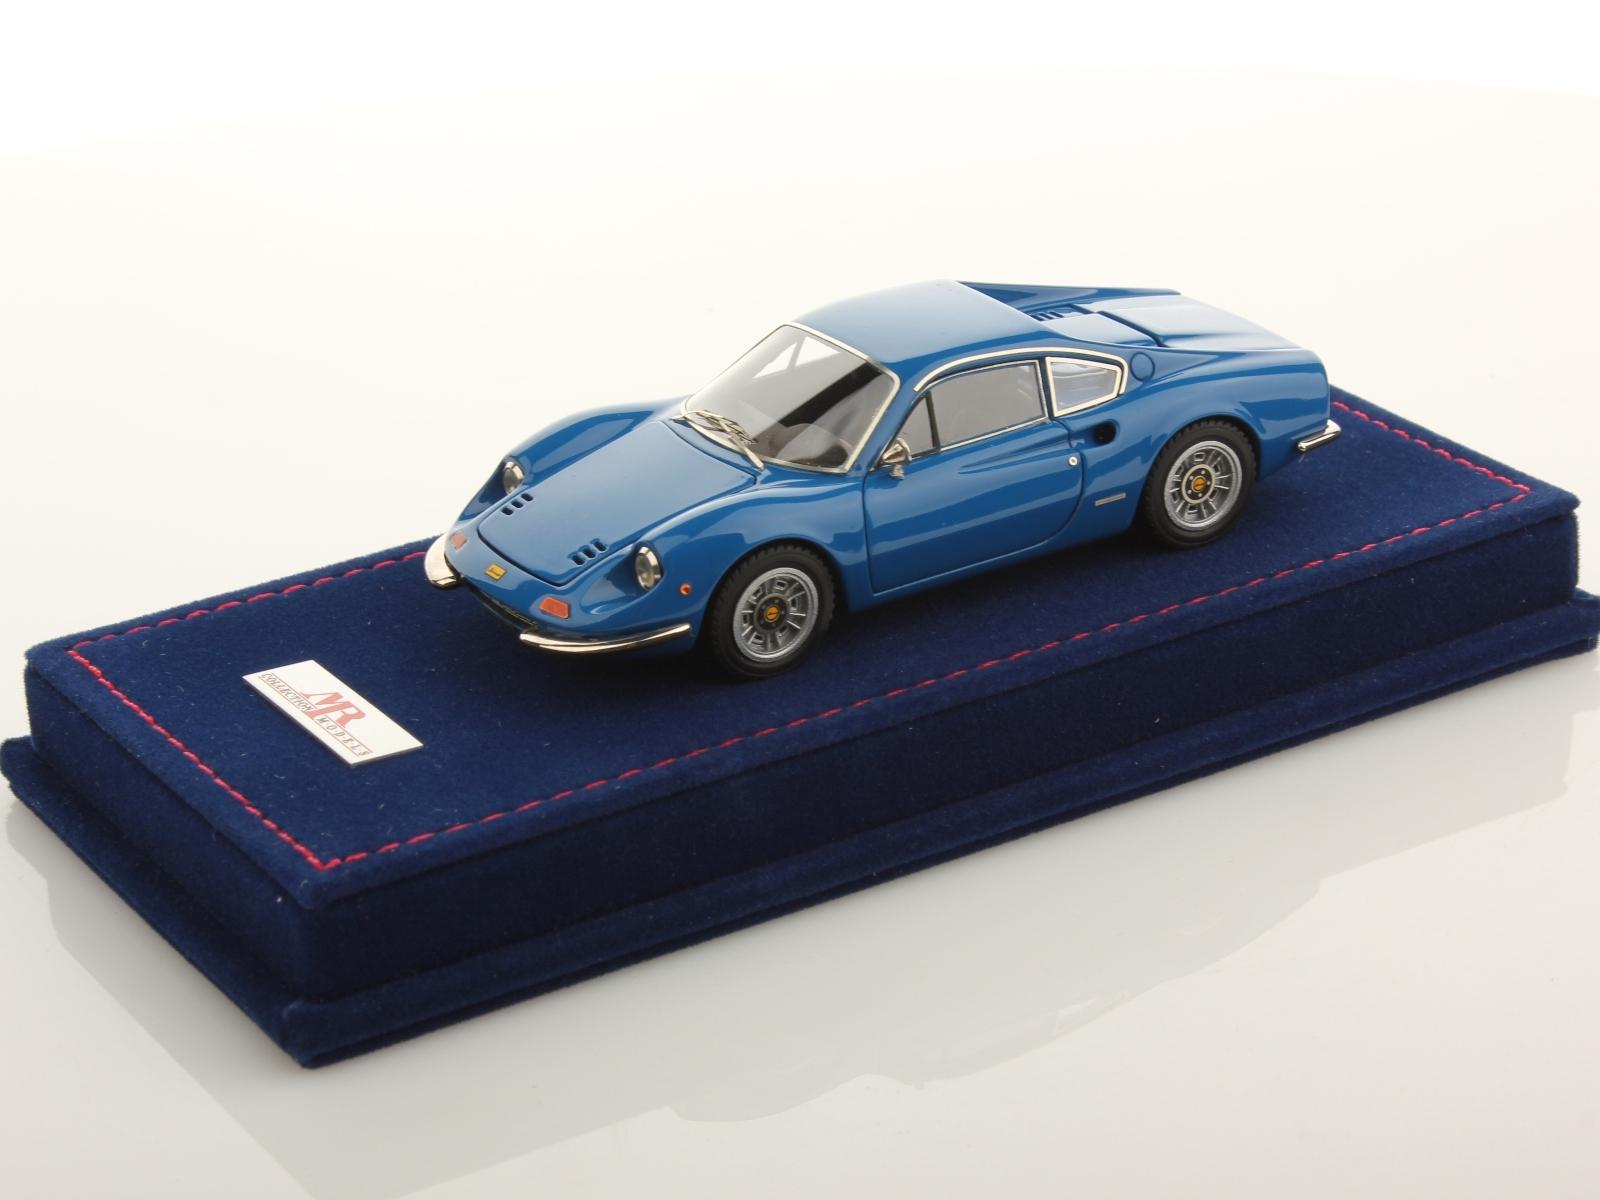 Ferrari Dino 246 Gt 1 43 Mr Collection Models